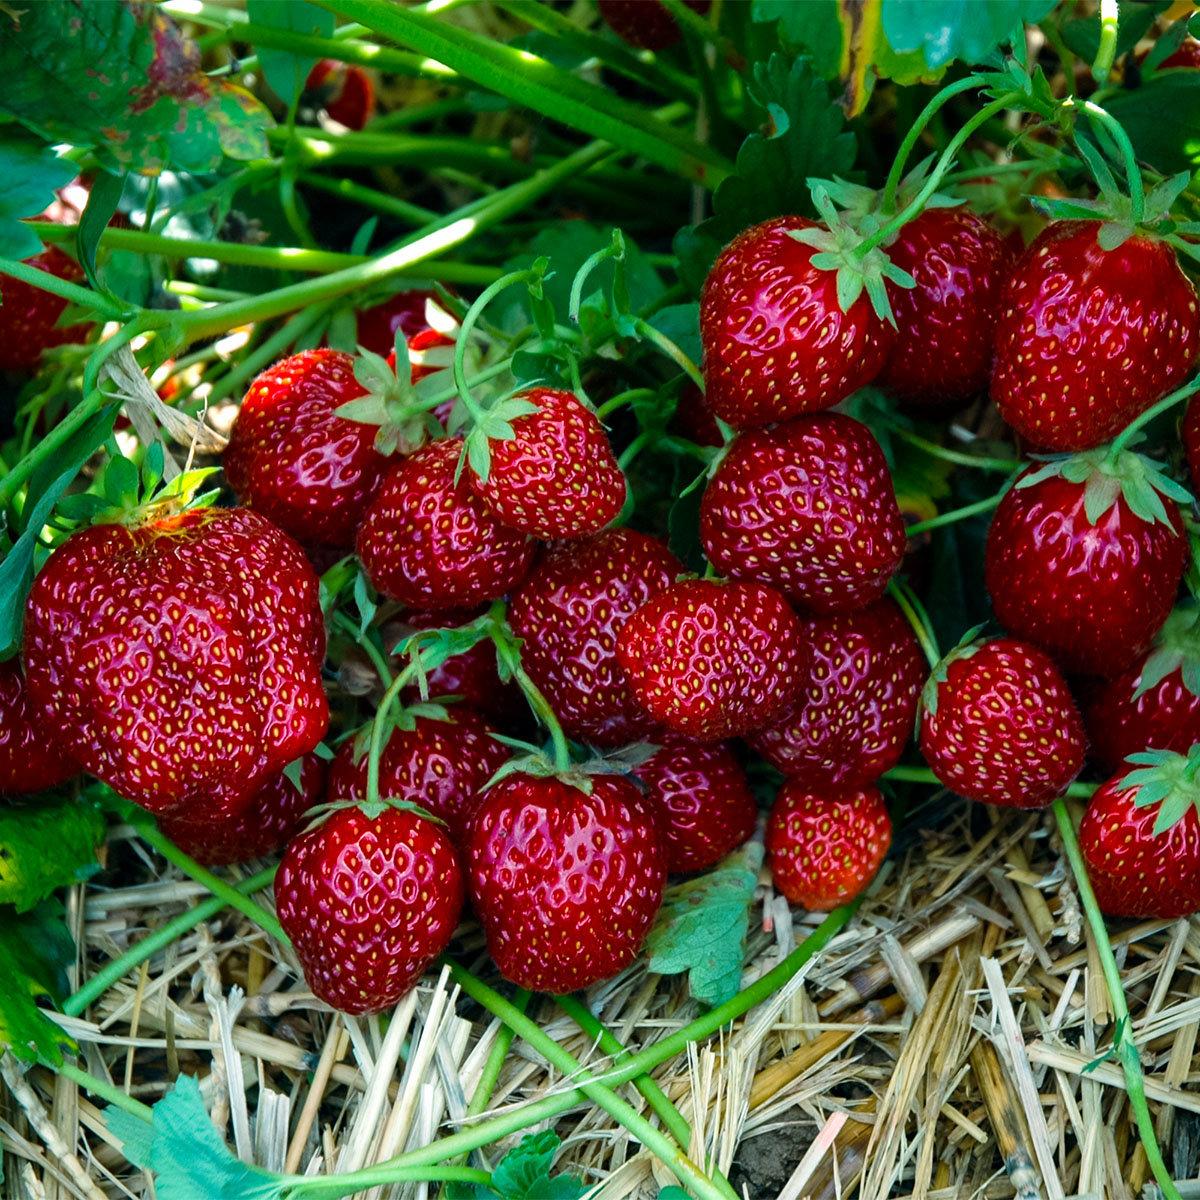 Erdbeere Aroma Auslese, Pflanzware 2x6er Tray, im ca. 7 cm-Topfballen